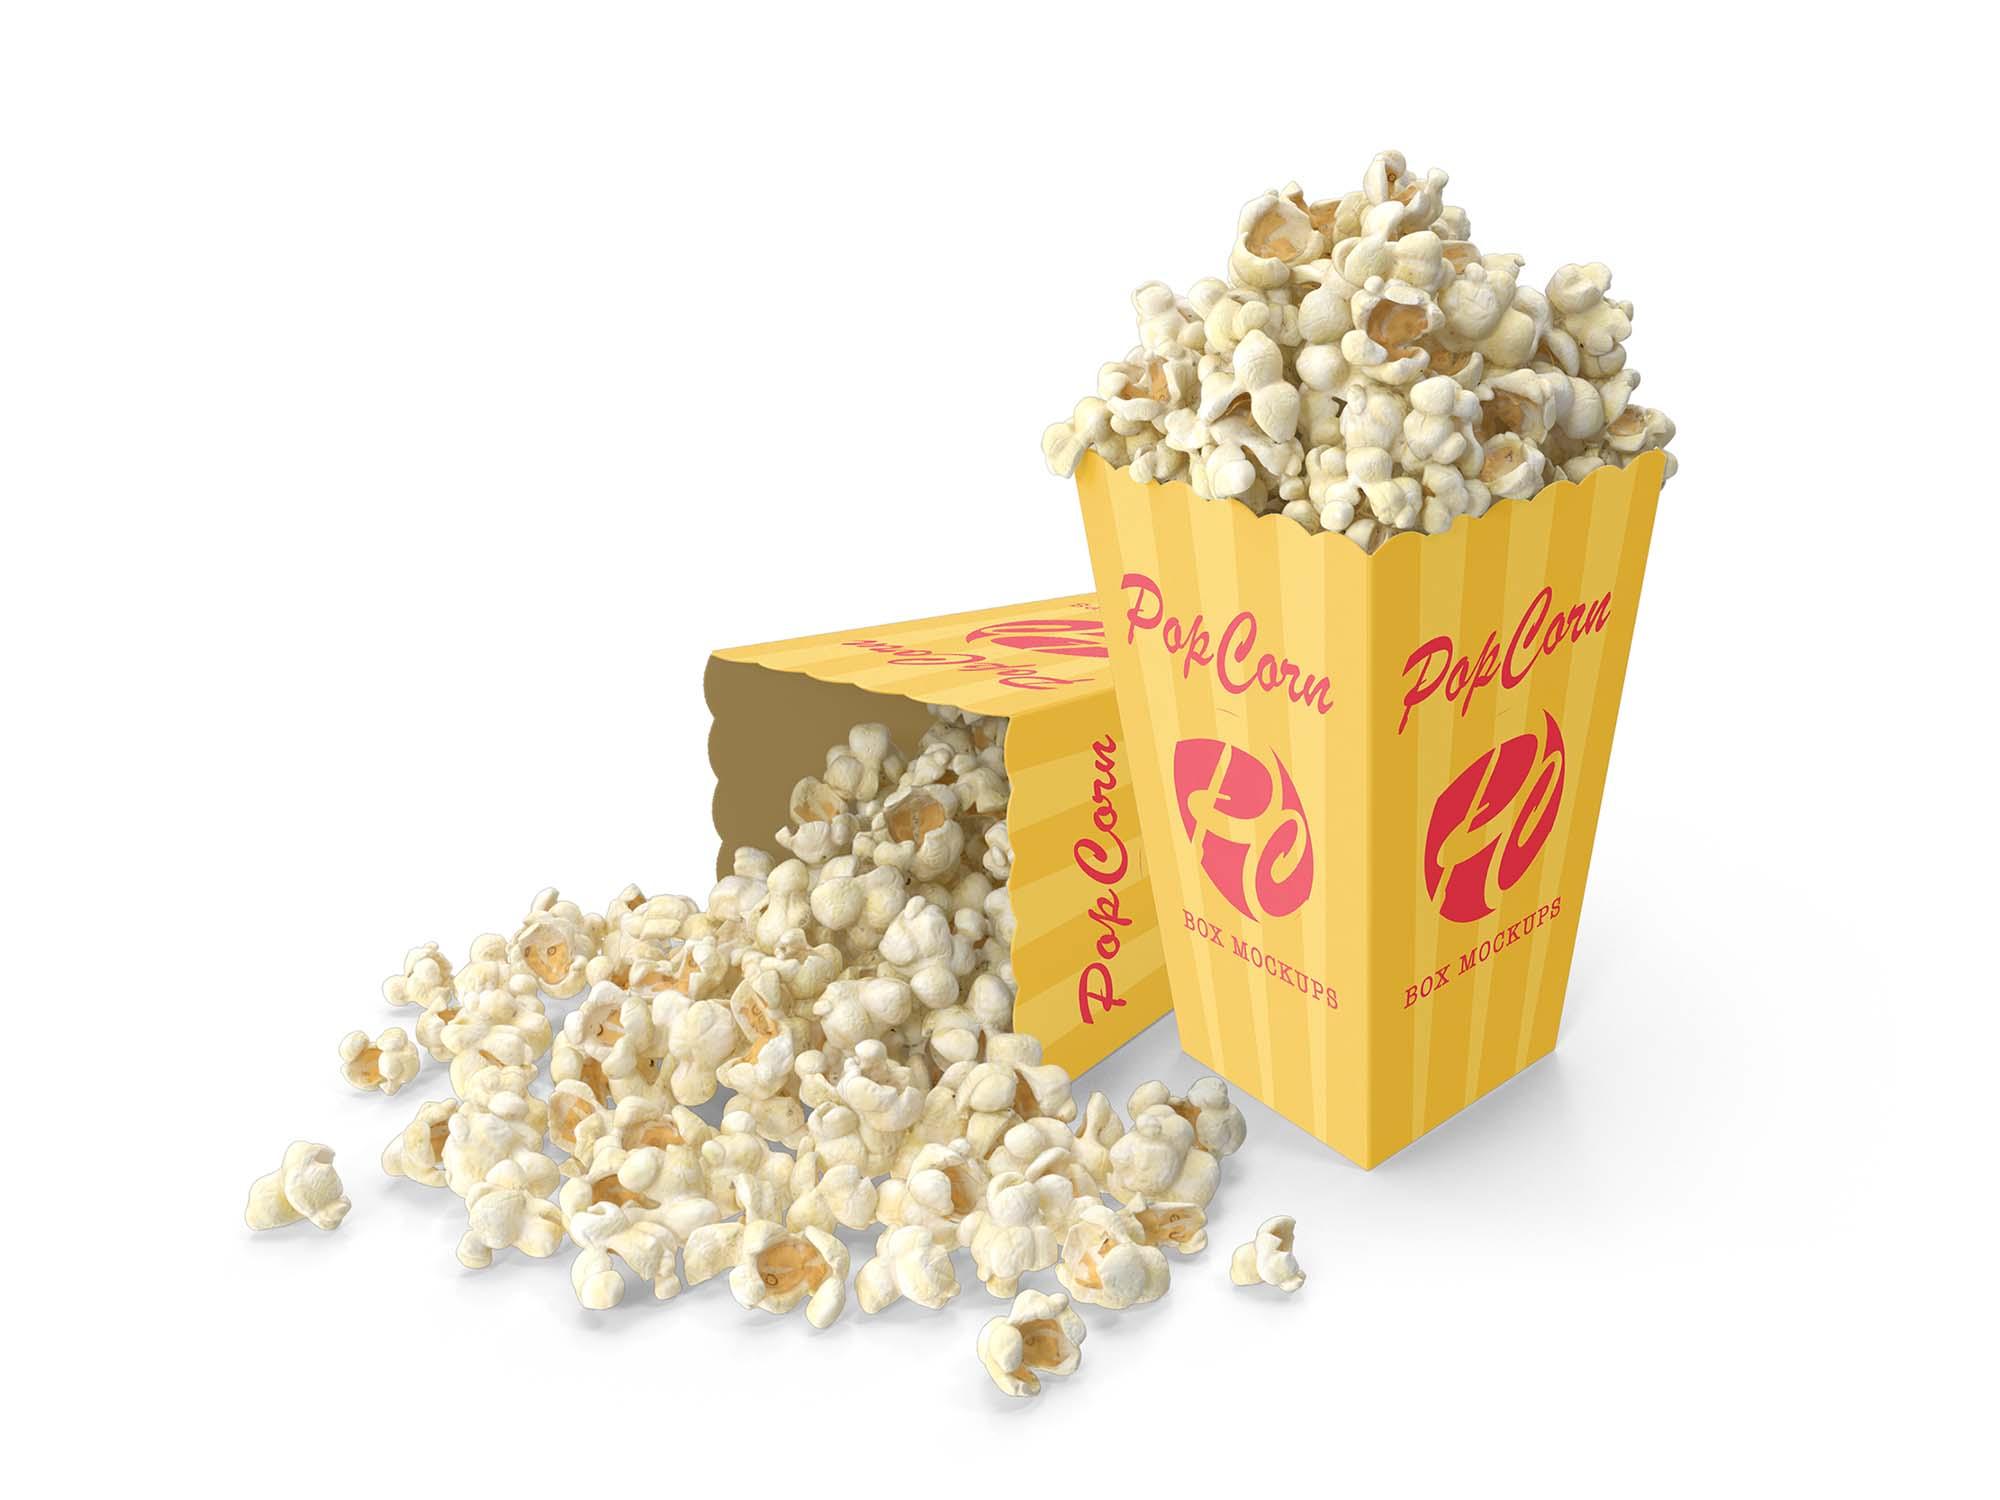 Popcorn Box Mockup 3